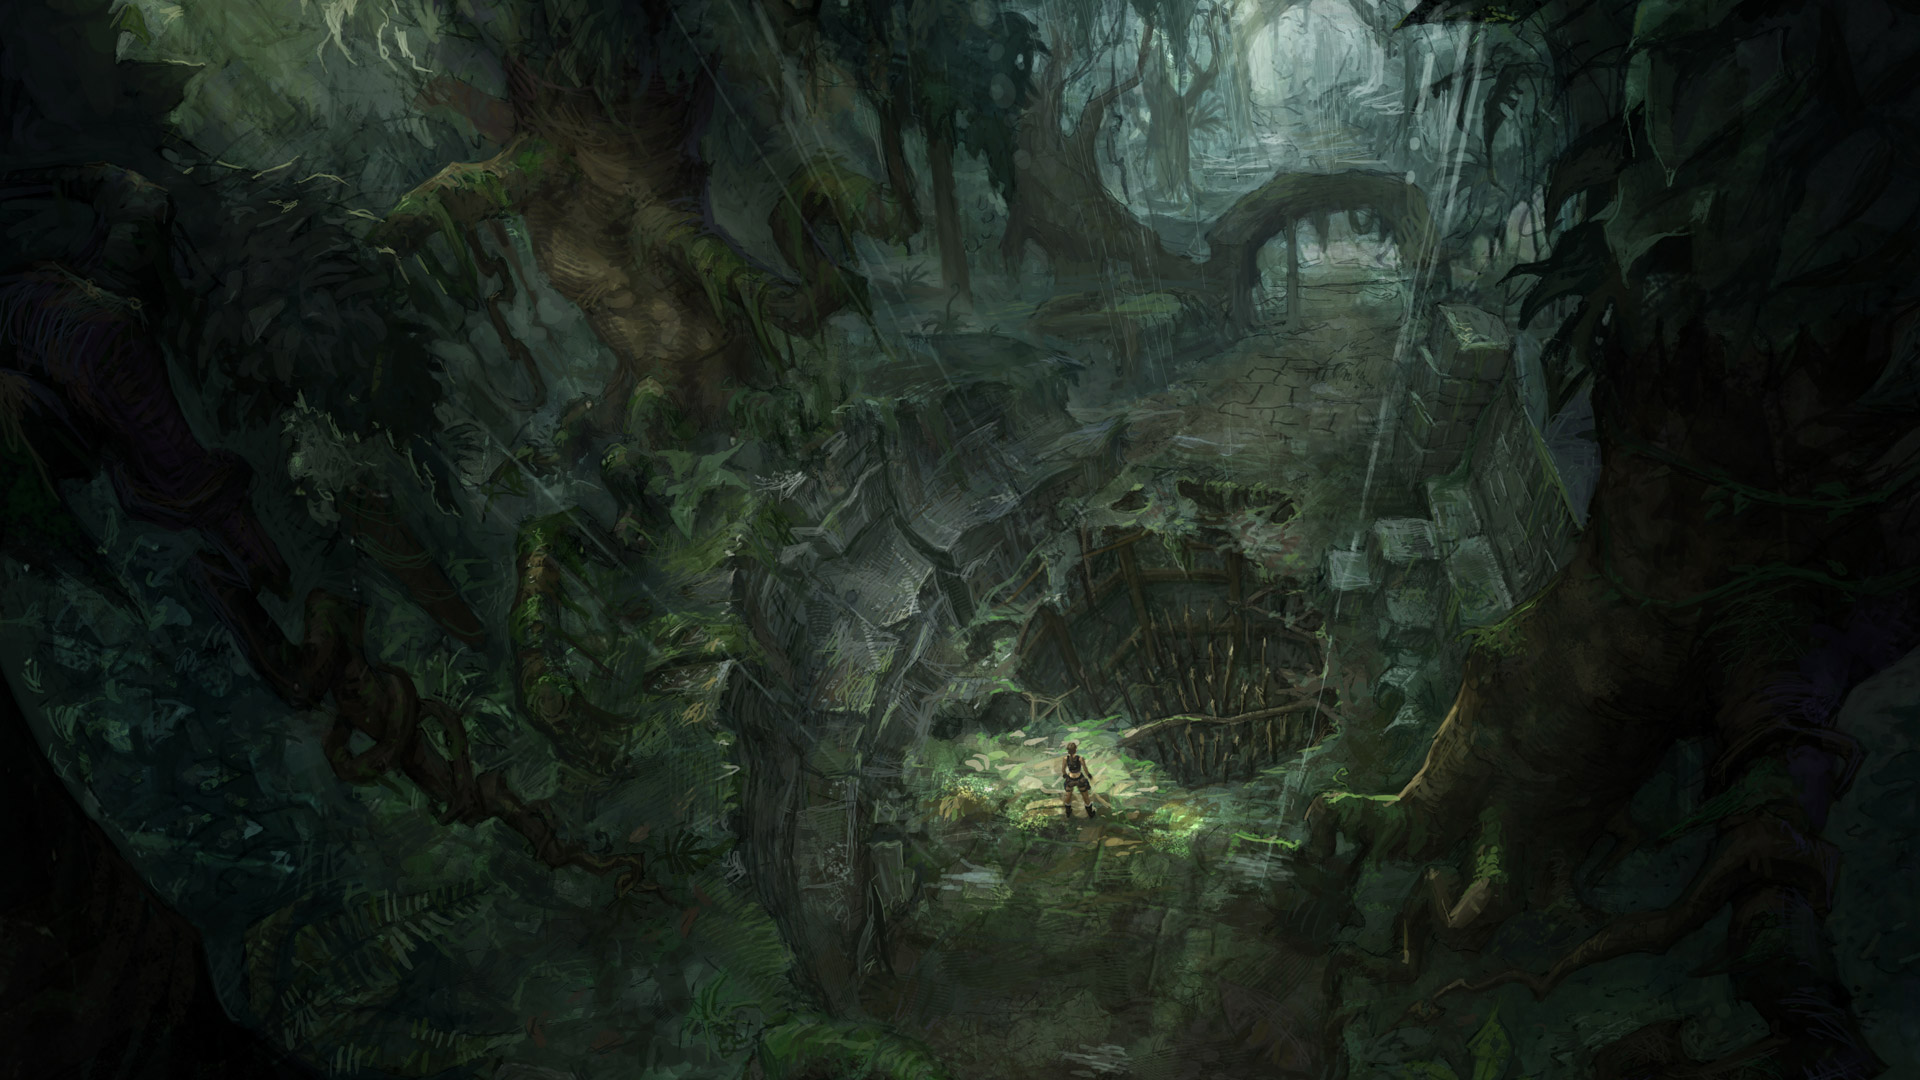 Tomb Raider: Underworld Wallpaper in 1920x1080